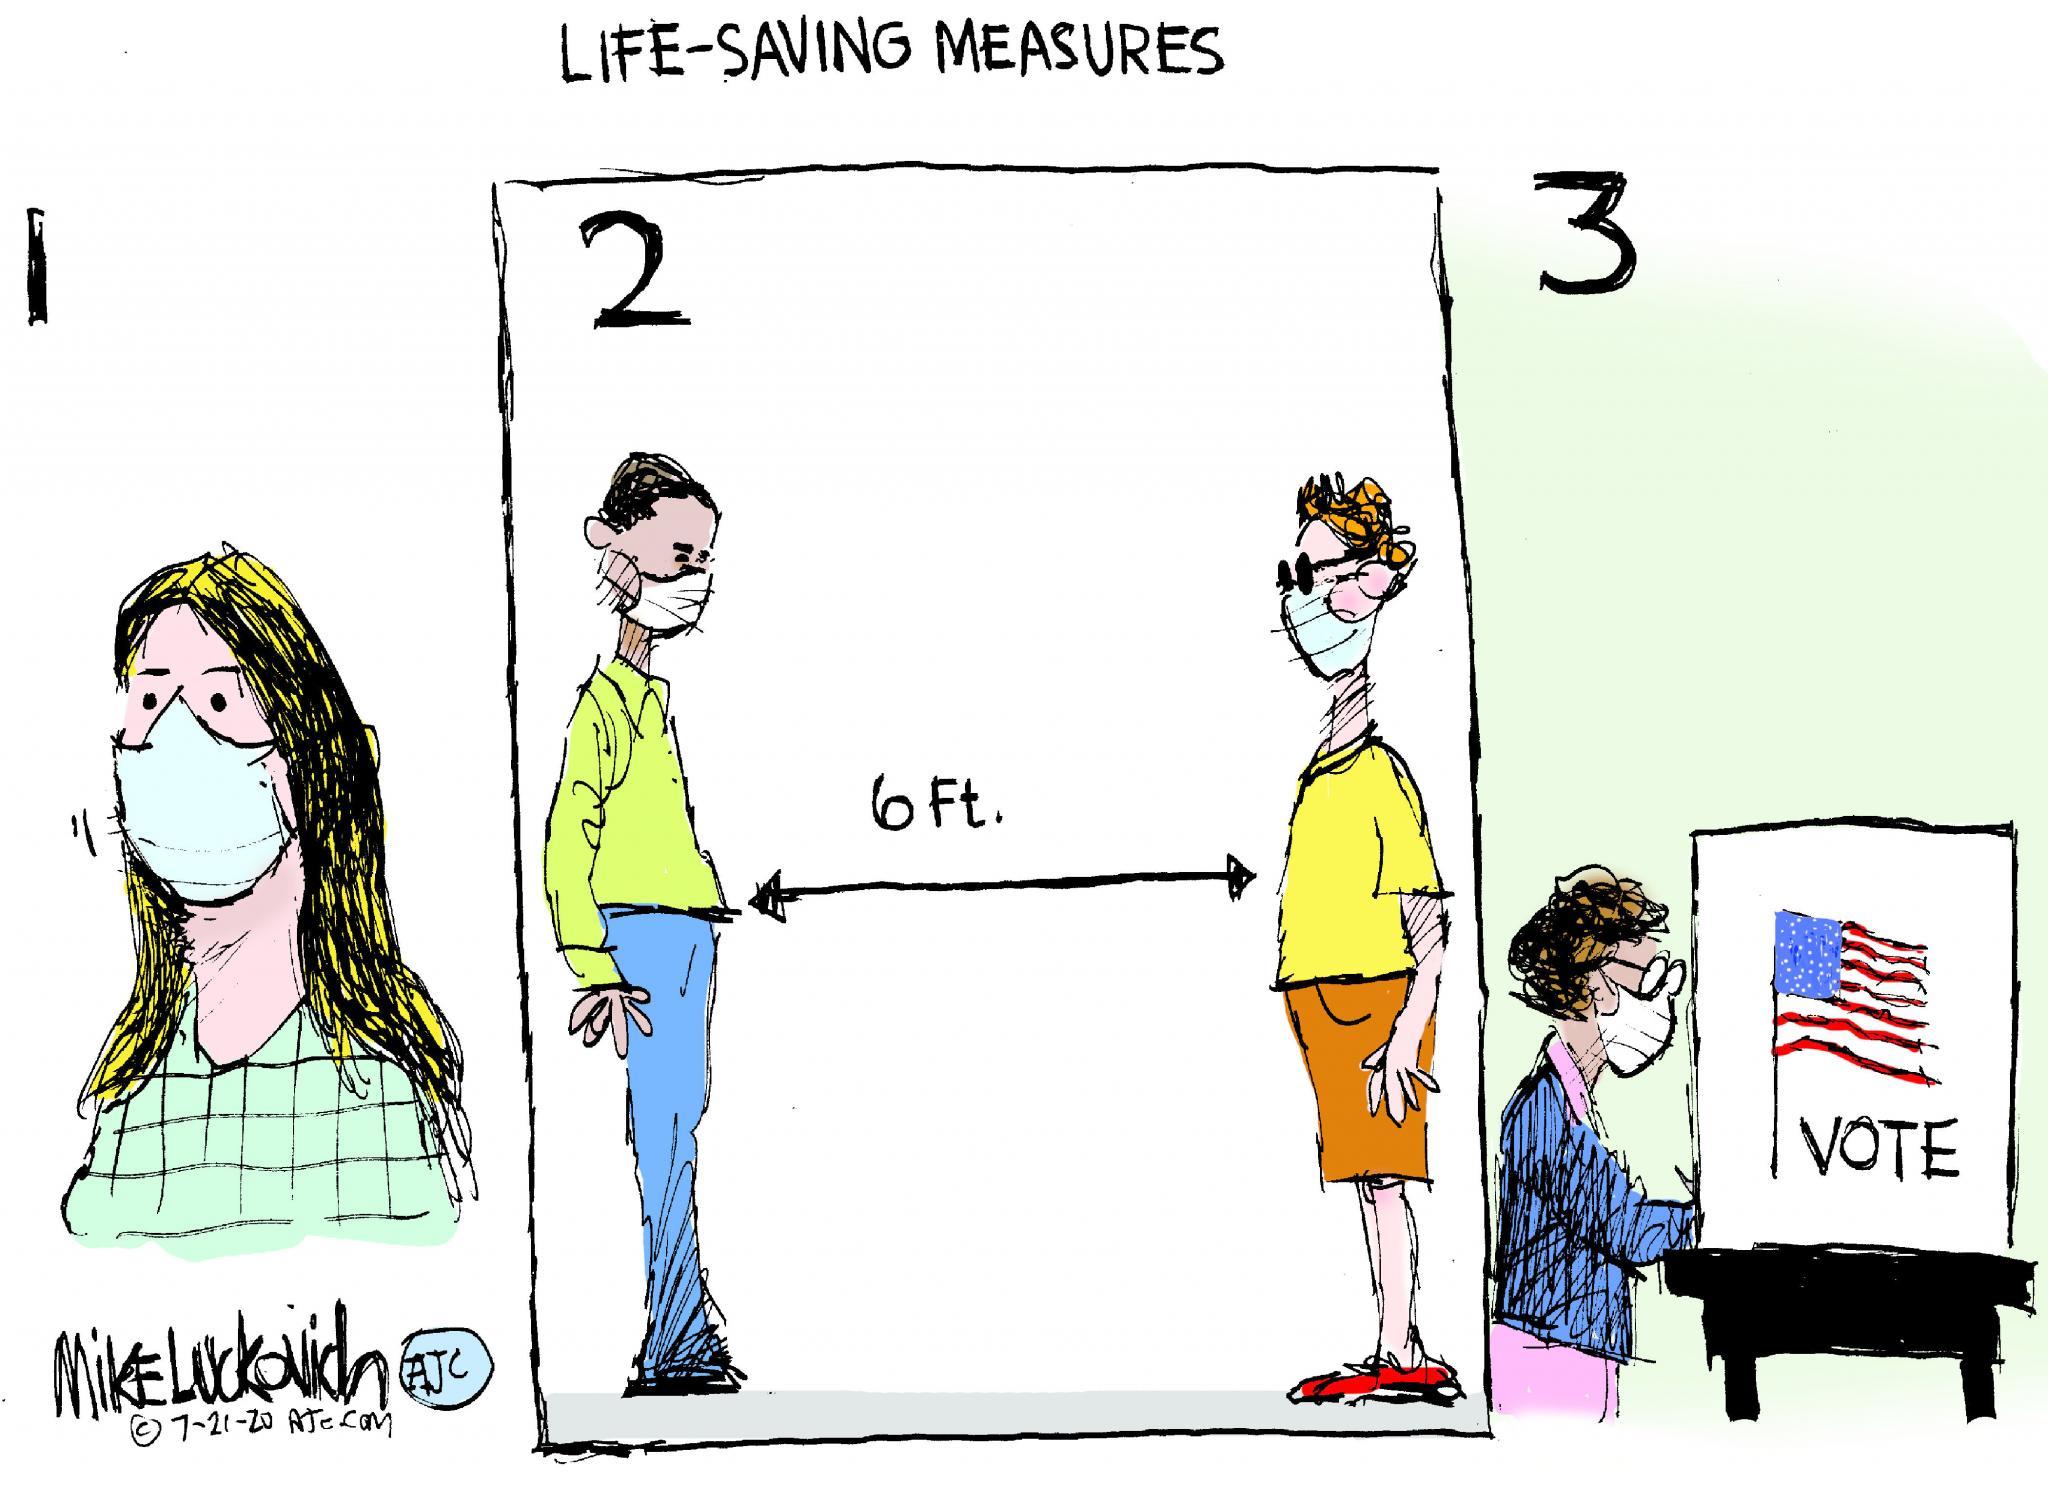 Political cartoons - the 'funny' pics thread.-lk072120dapr-jpg